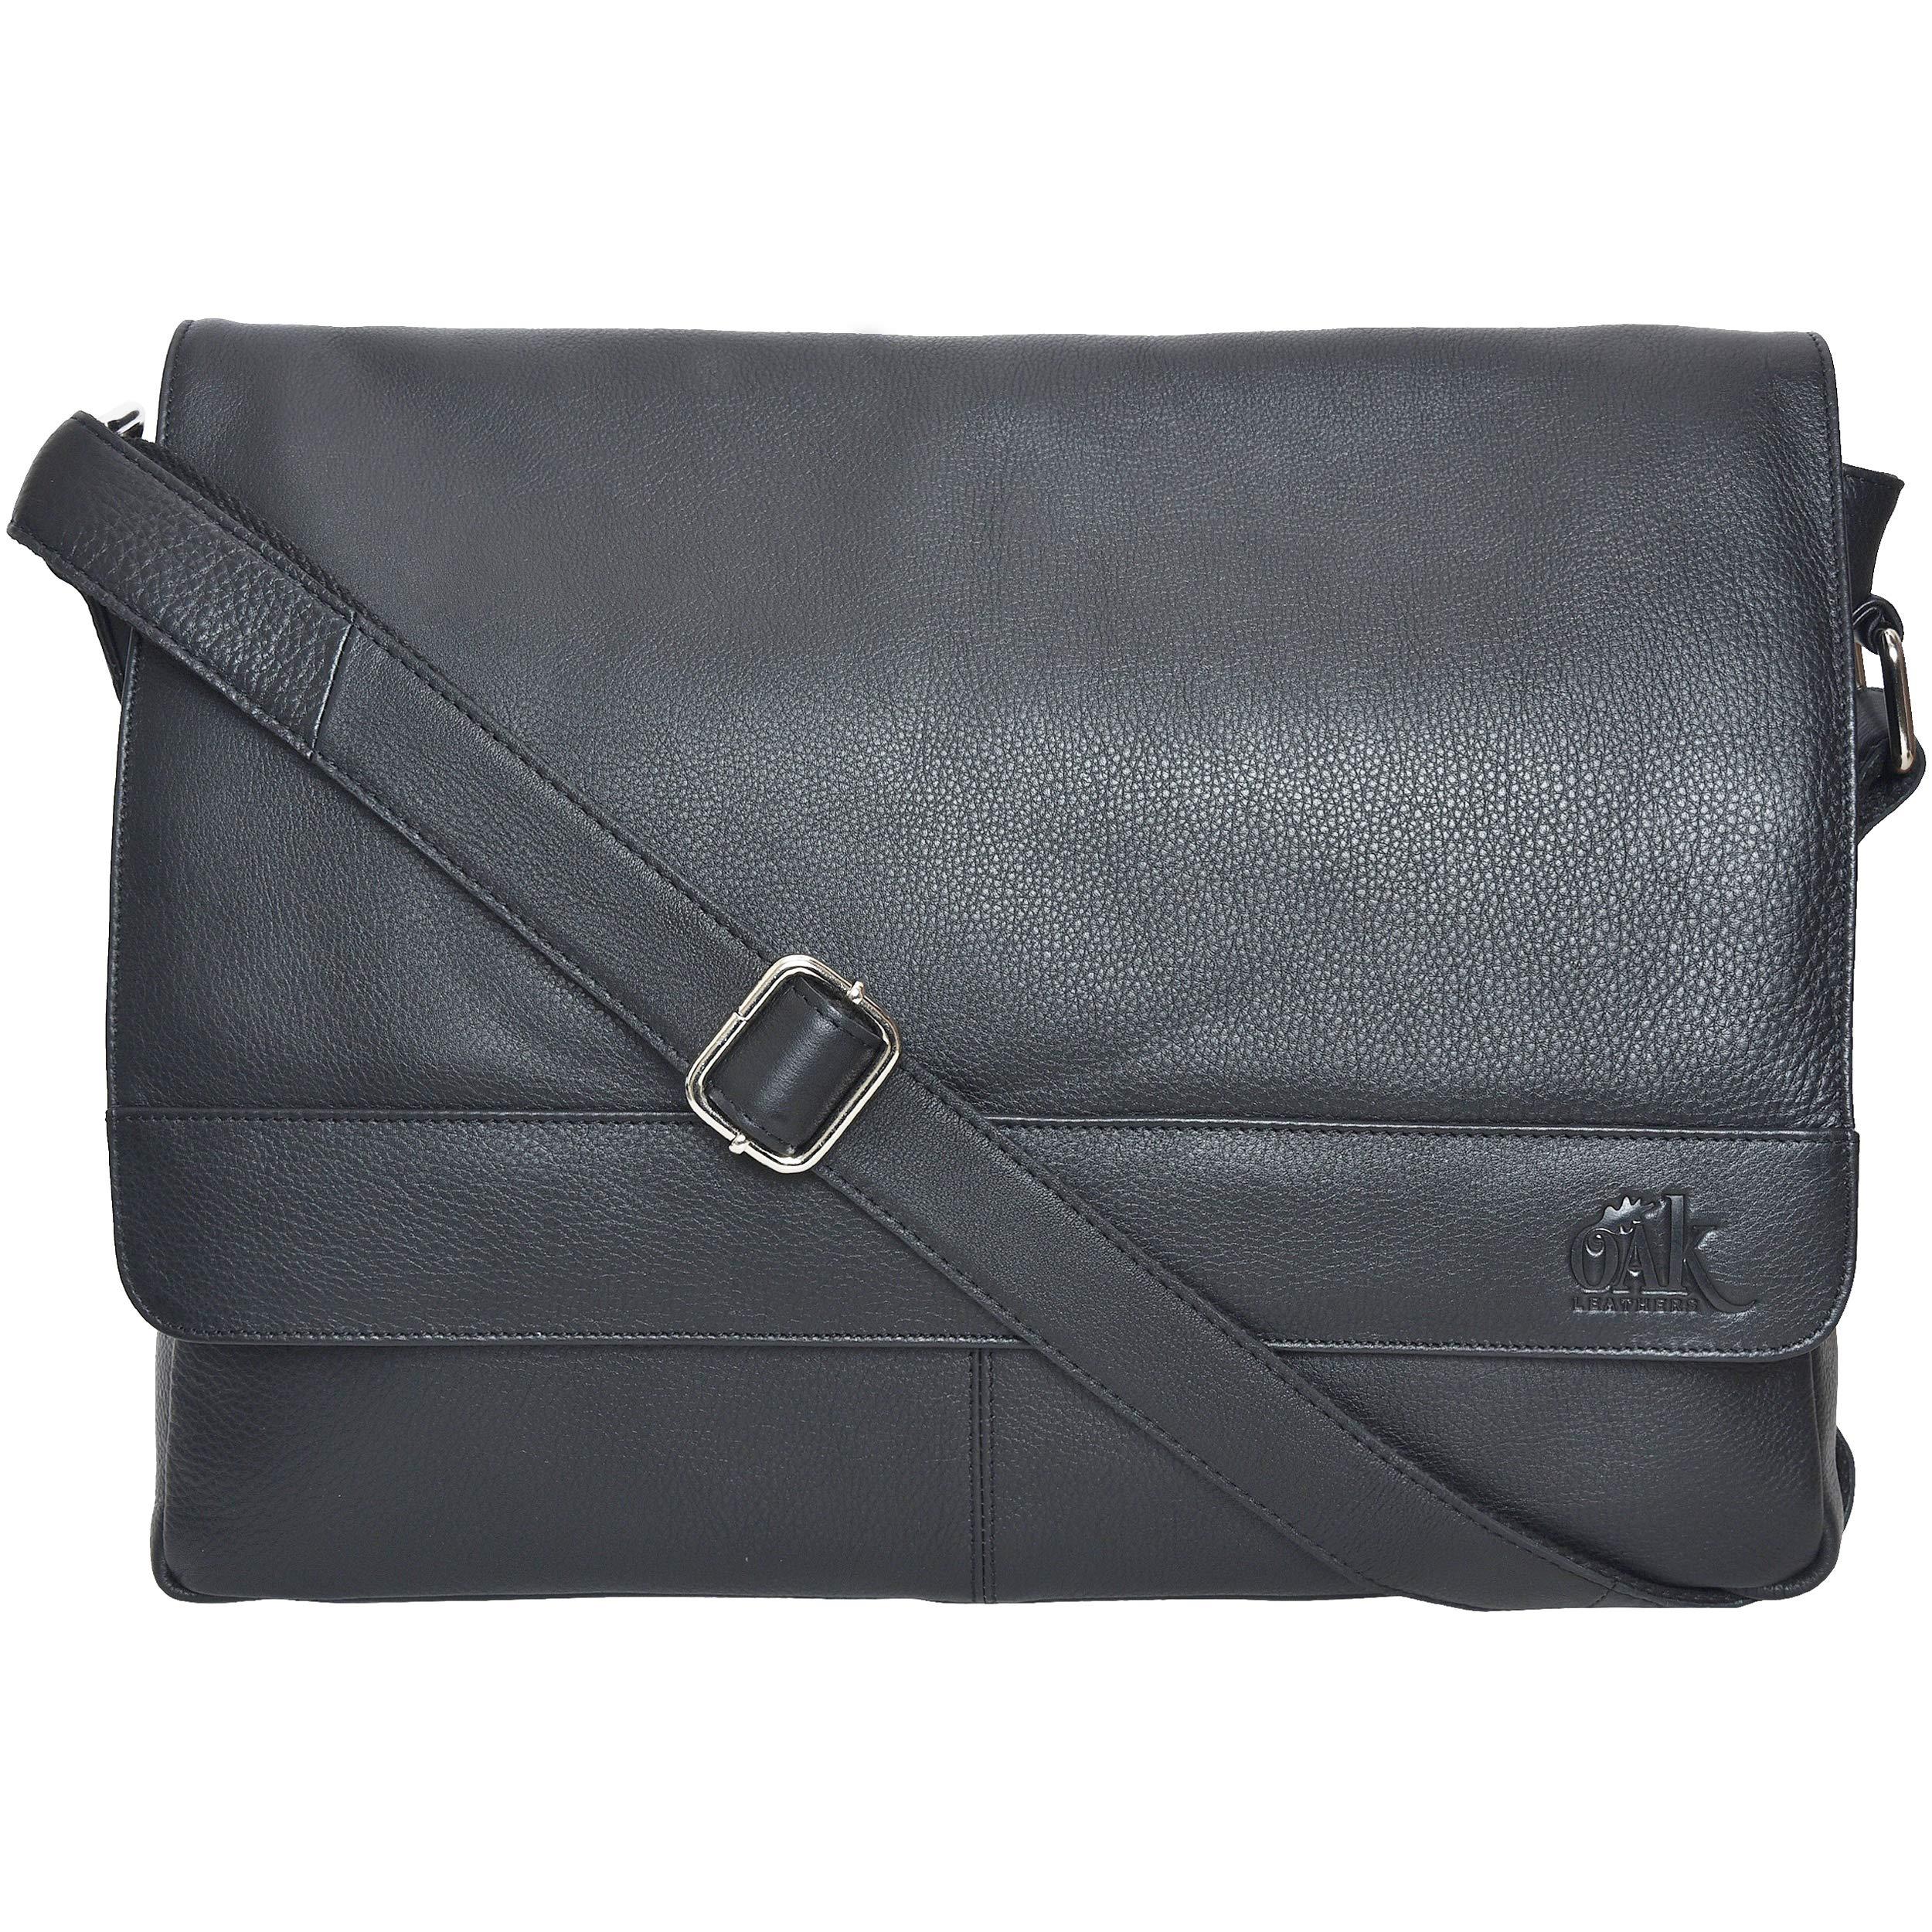 8a77dd13ea Leather Laptop Messenger Bag for Men -Office Briefcase 15